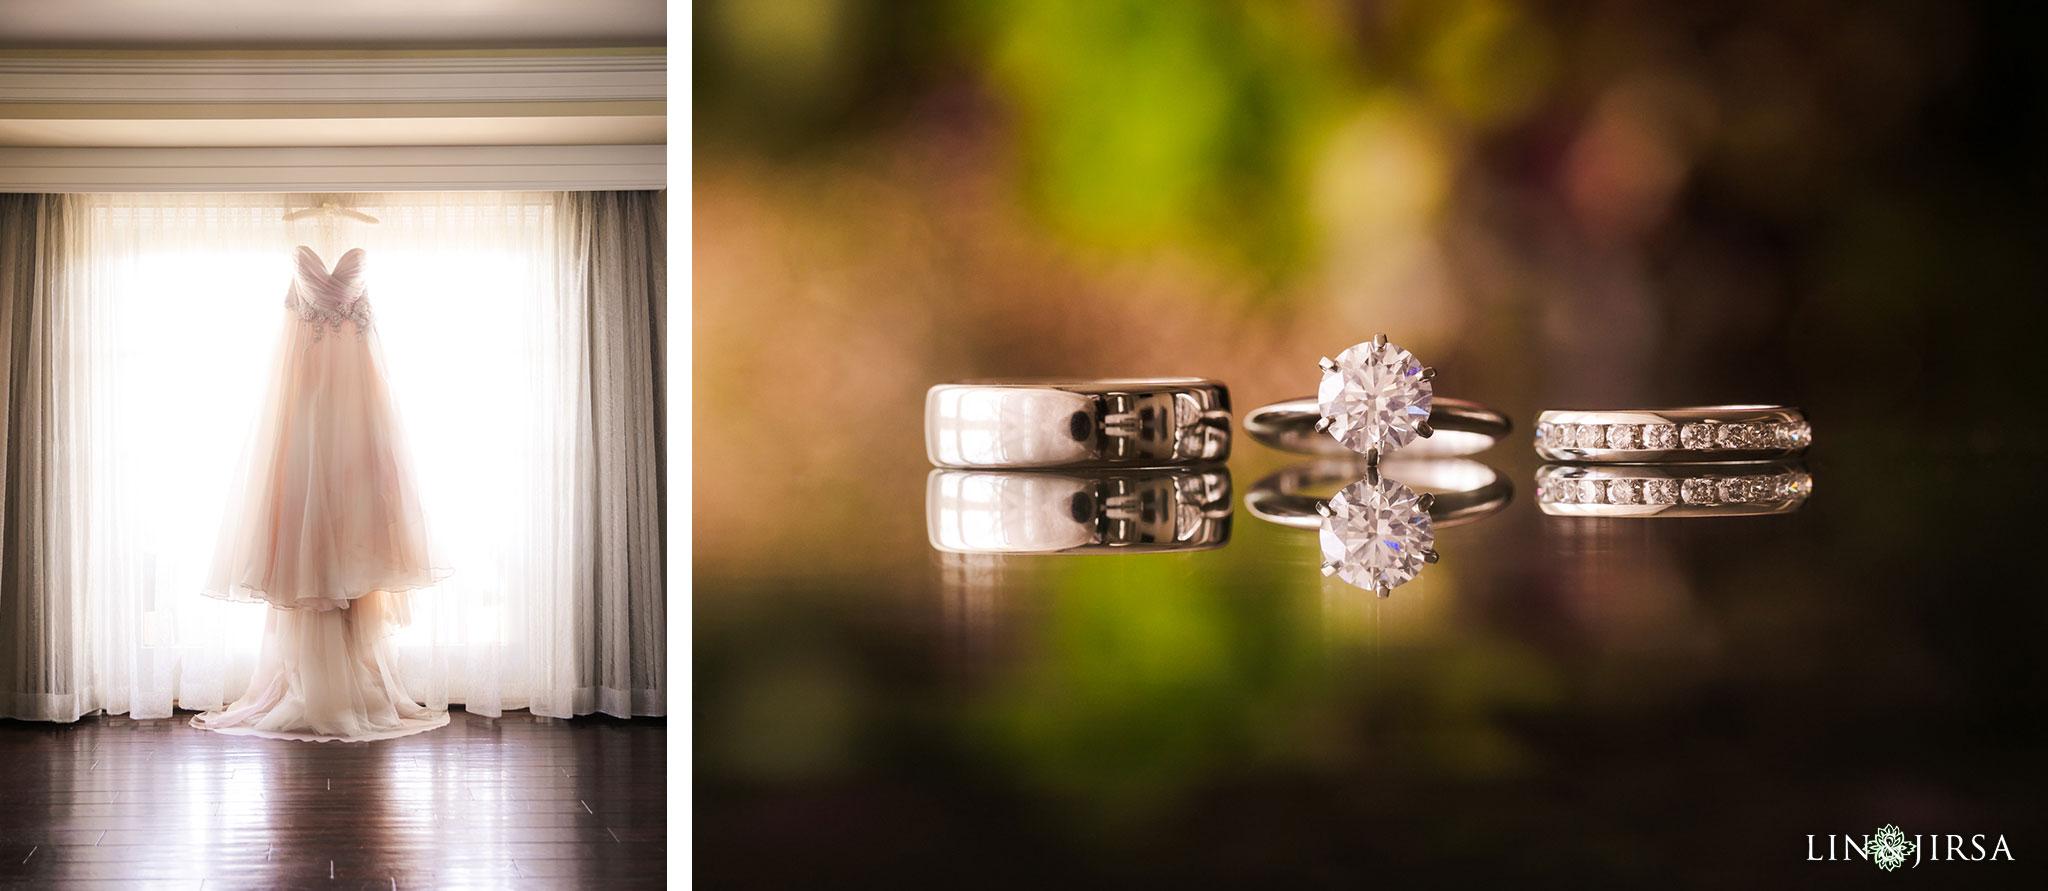 ZJL ritz carlton laguna niguel wedding photography